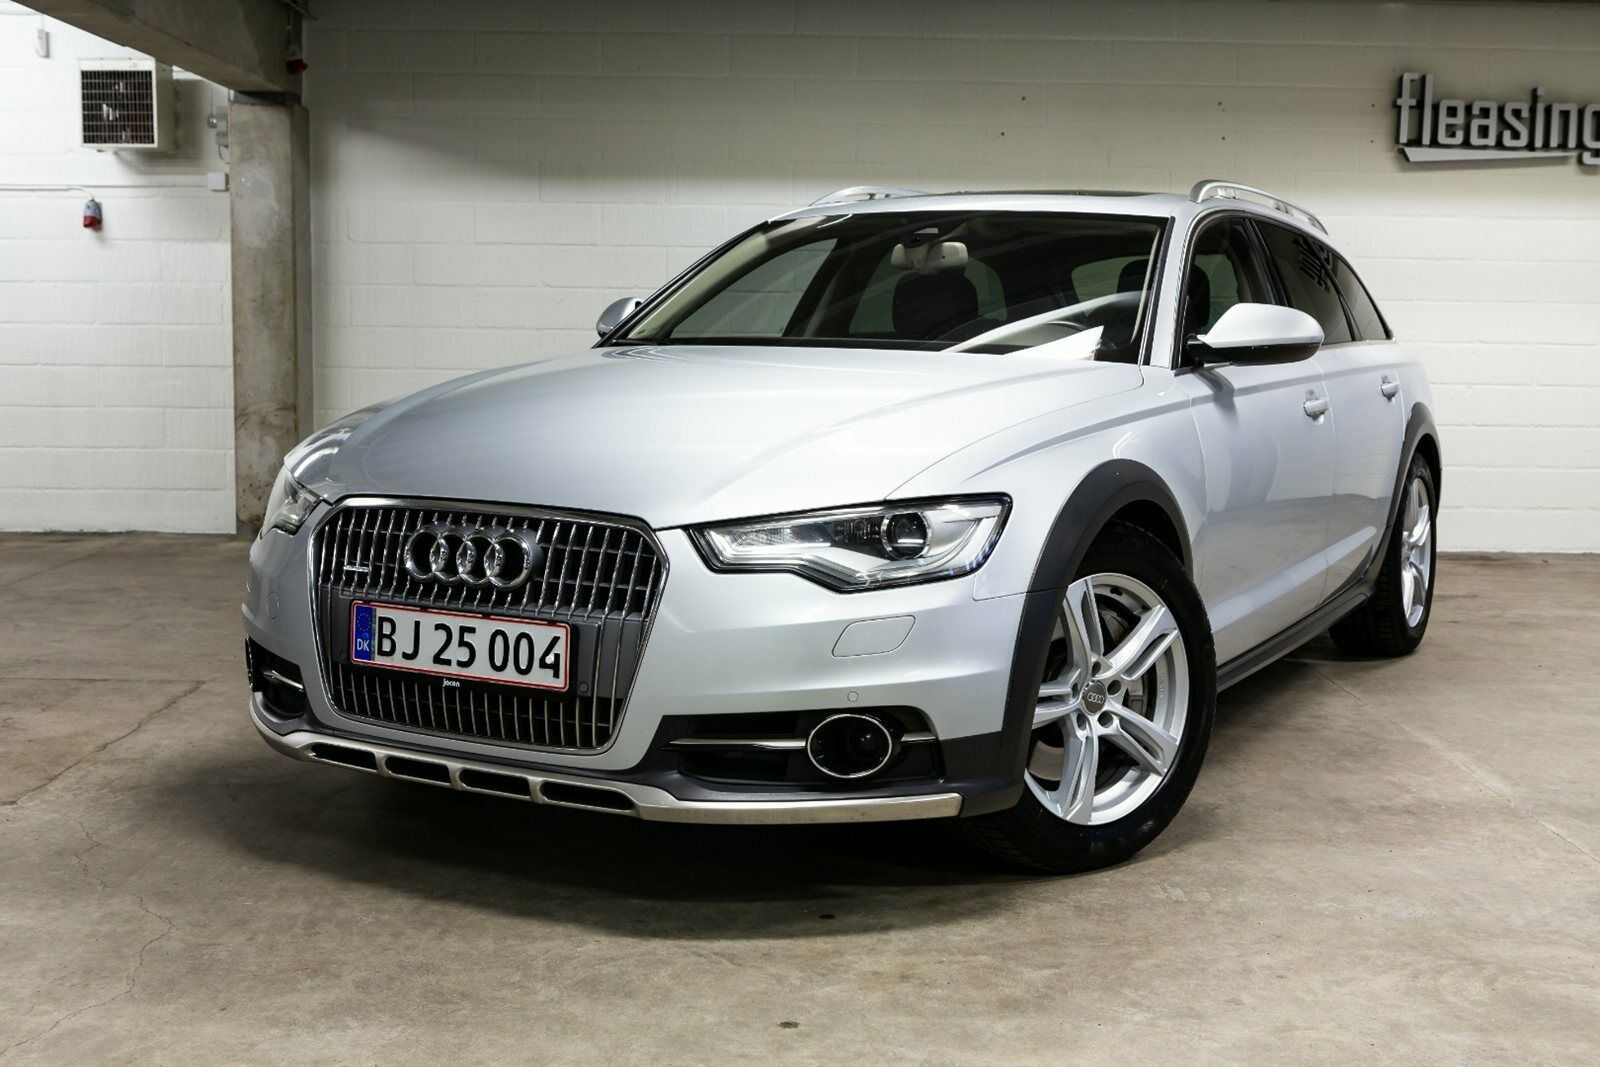 Audi A6 allroad 3,0 TFSi 310 quattro S-tr. 5d - 3.198 kr.